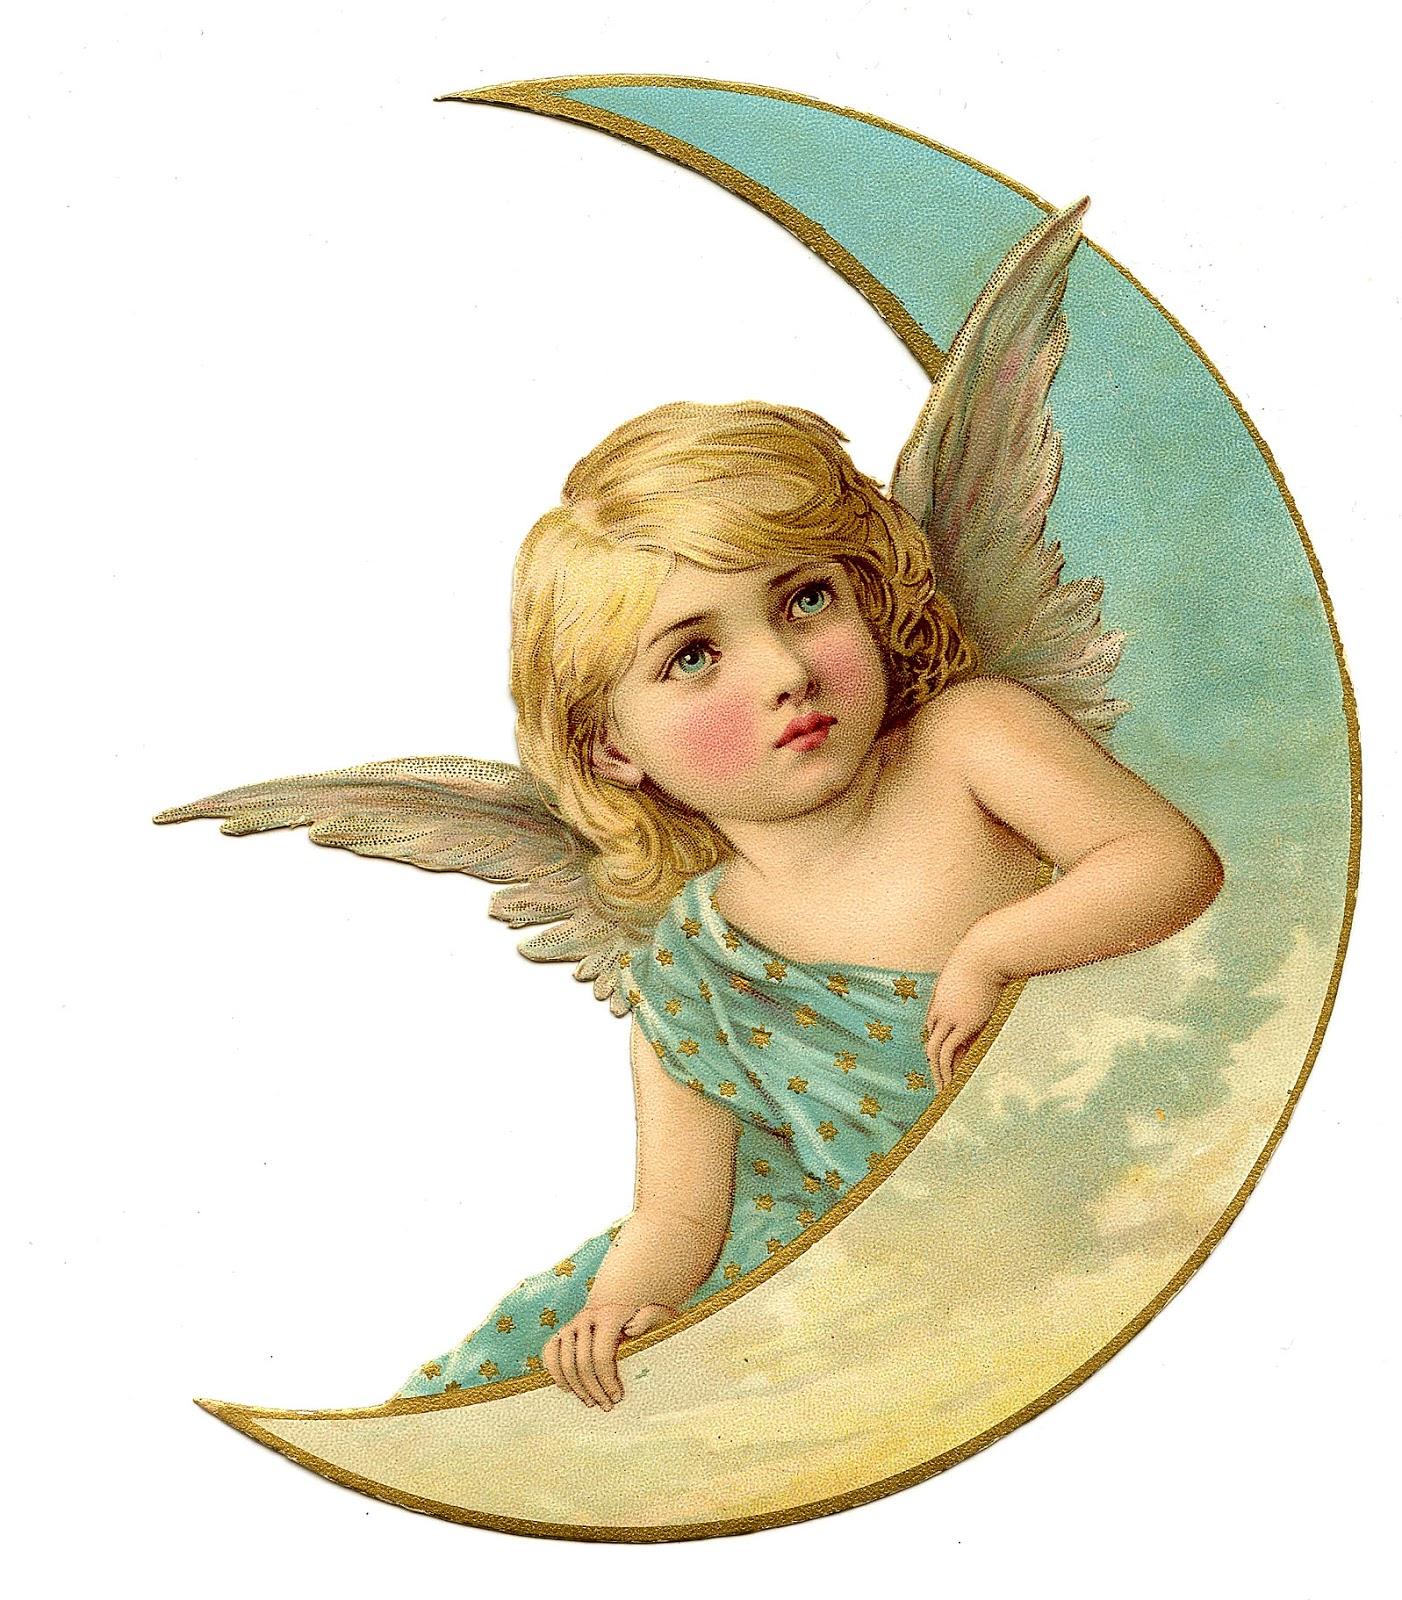 Angel jpg clipart jpg library stock Free Victorian Angel Cliparts, Download Free Clip Art, Free Clip Art ... jpg library stock